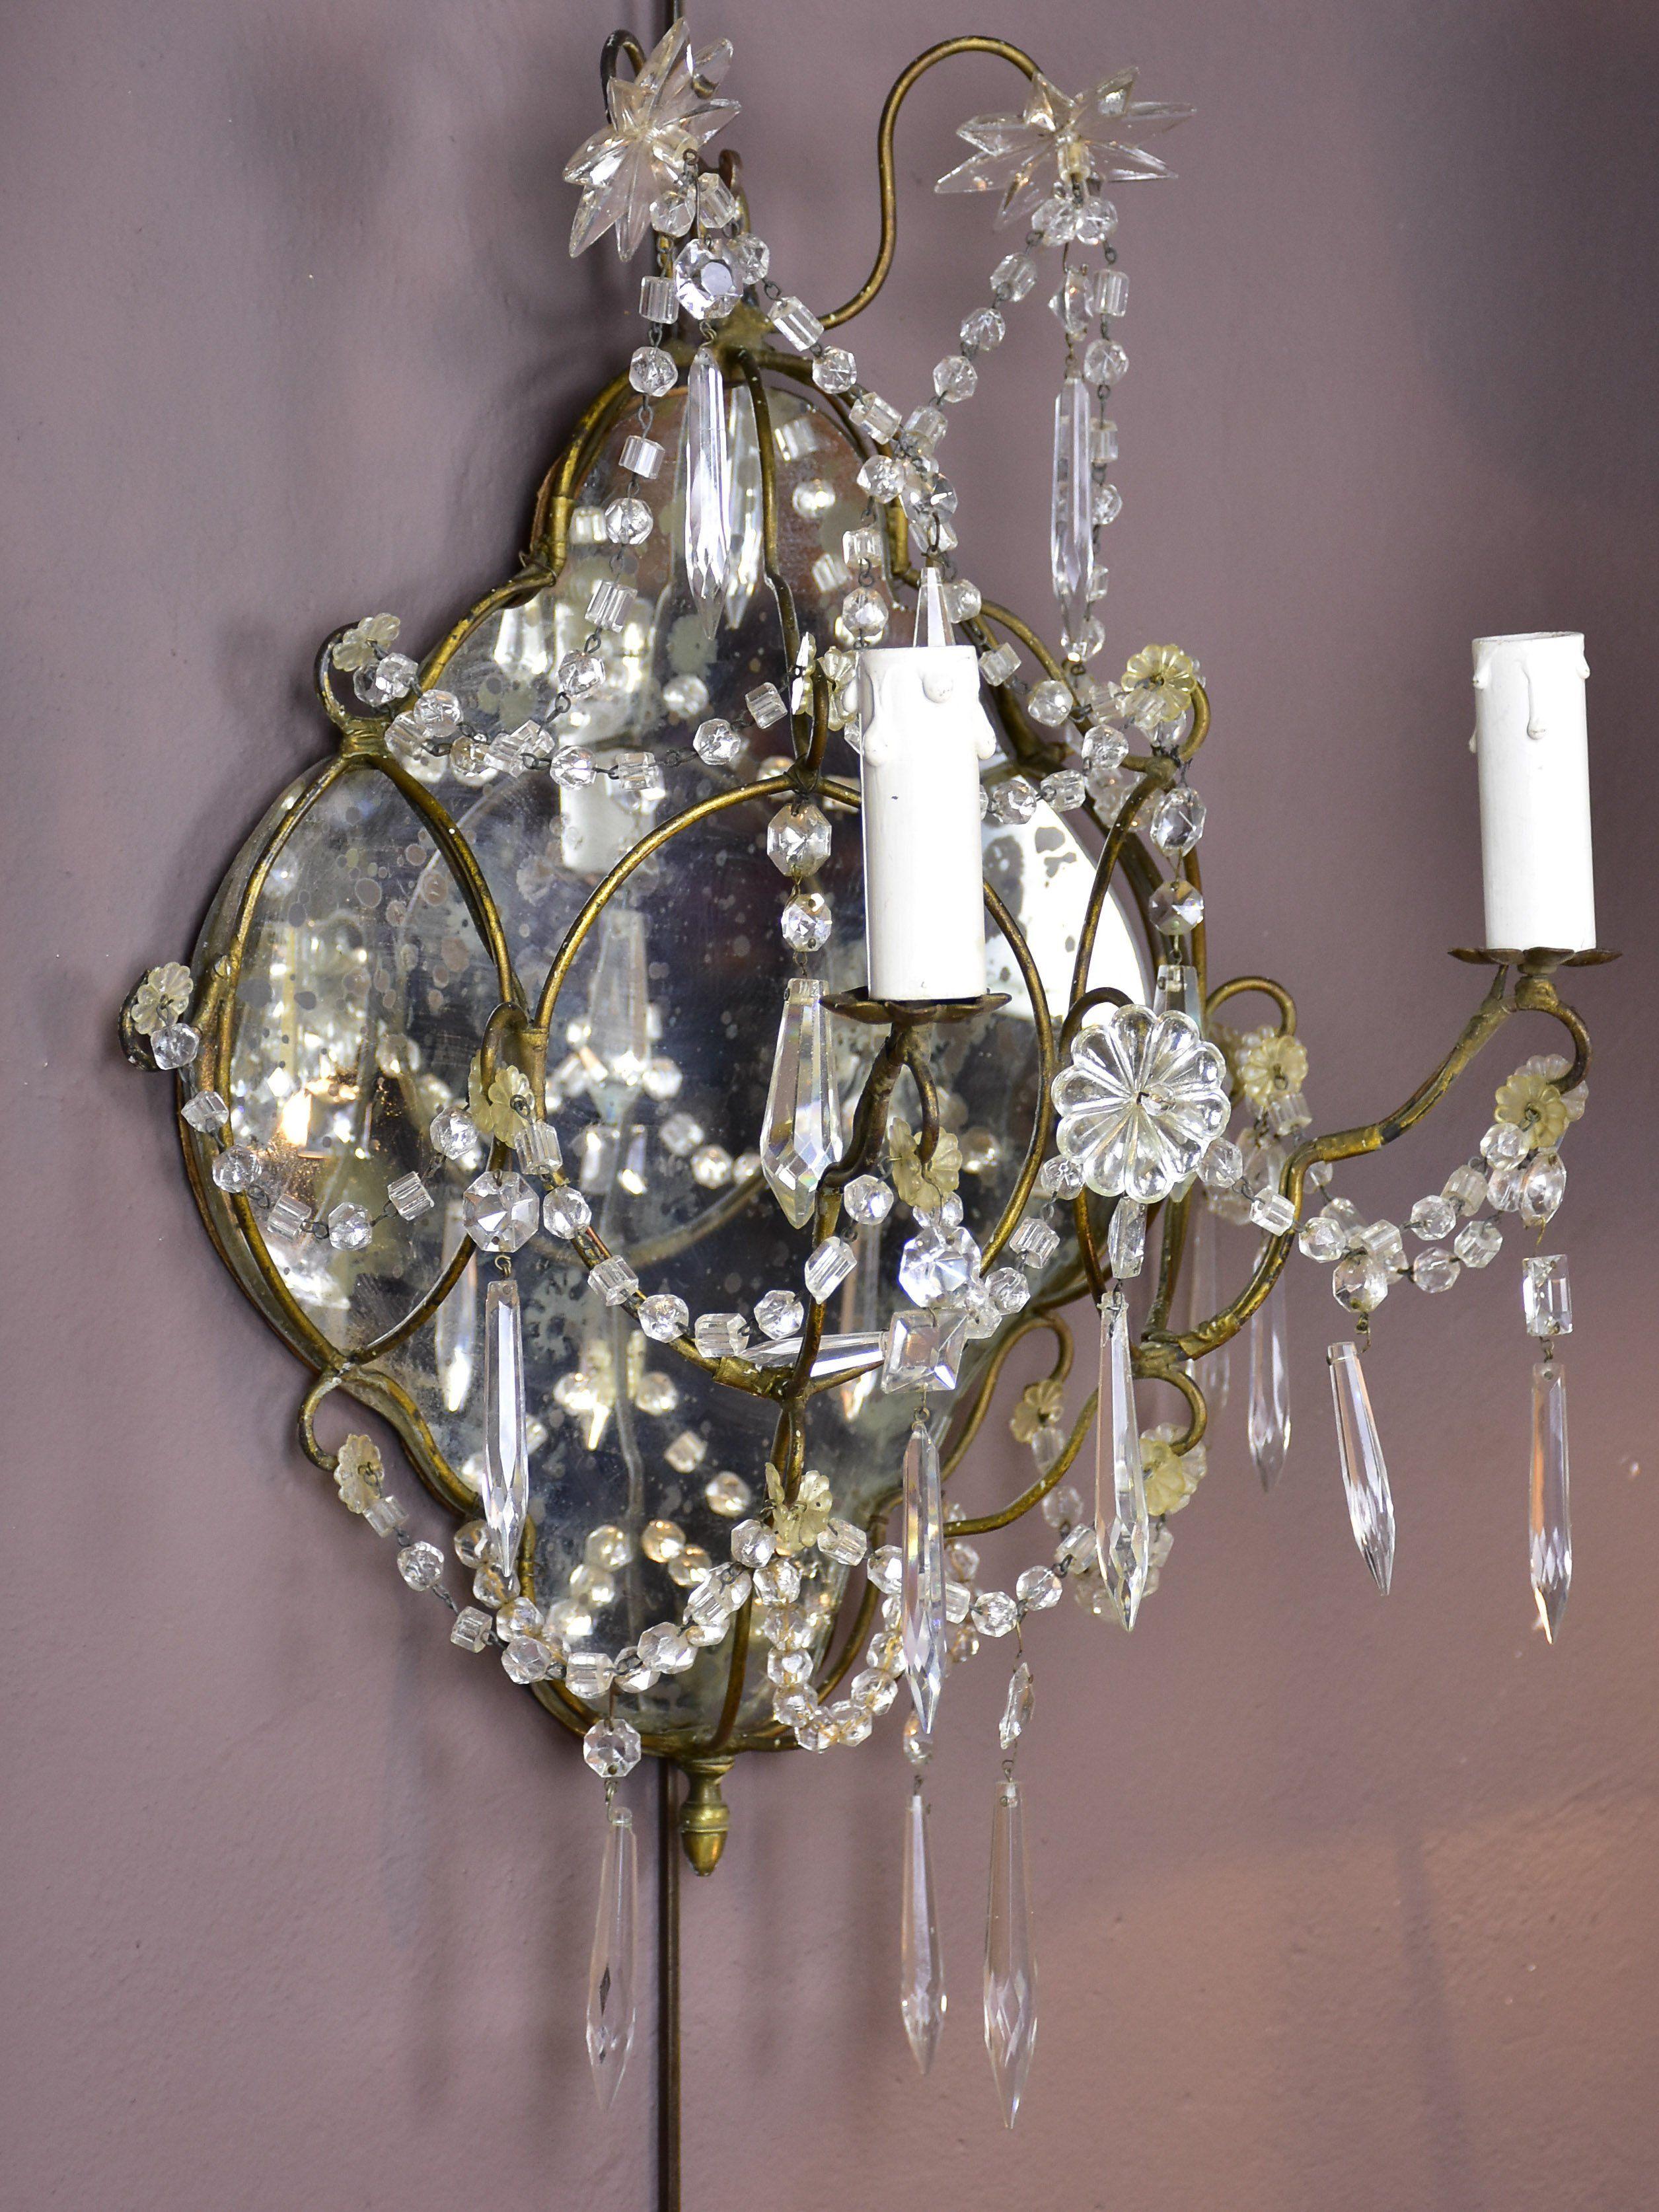 Pair Of Late 19th Century Venetian Mirrored Wall Sconces Mirrored Wall Sconce Chandelier Sconces